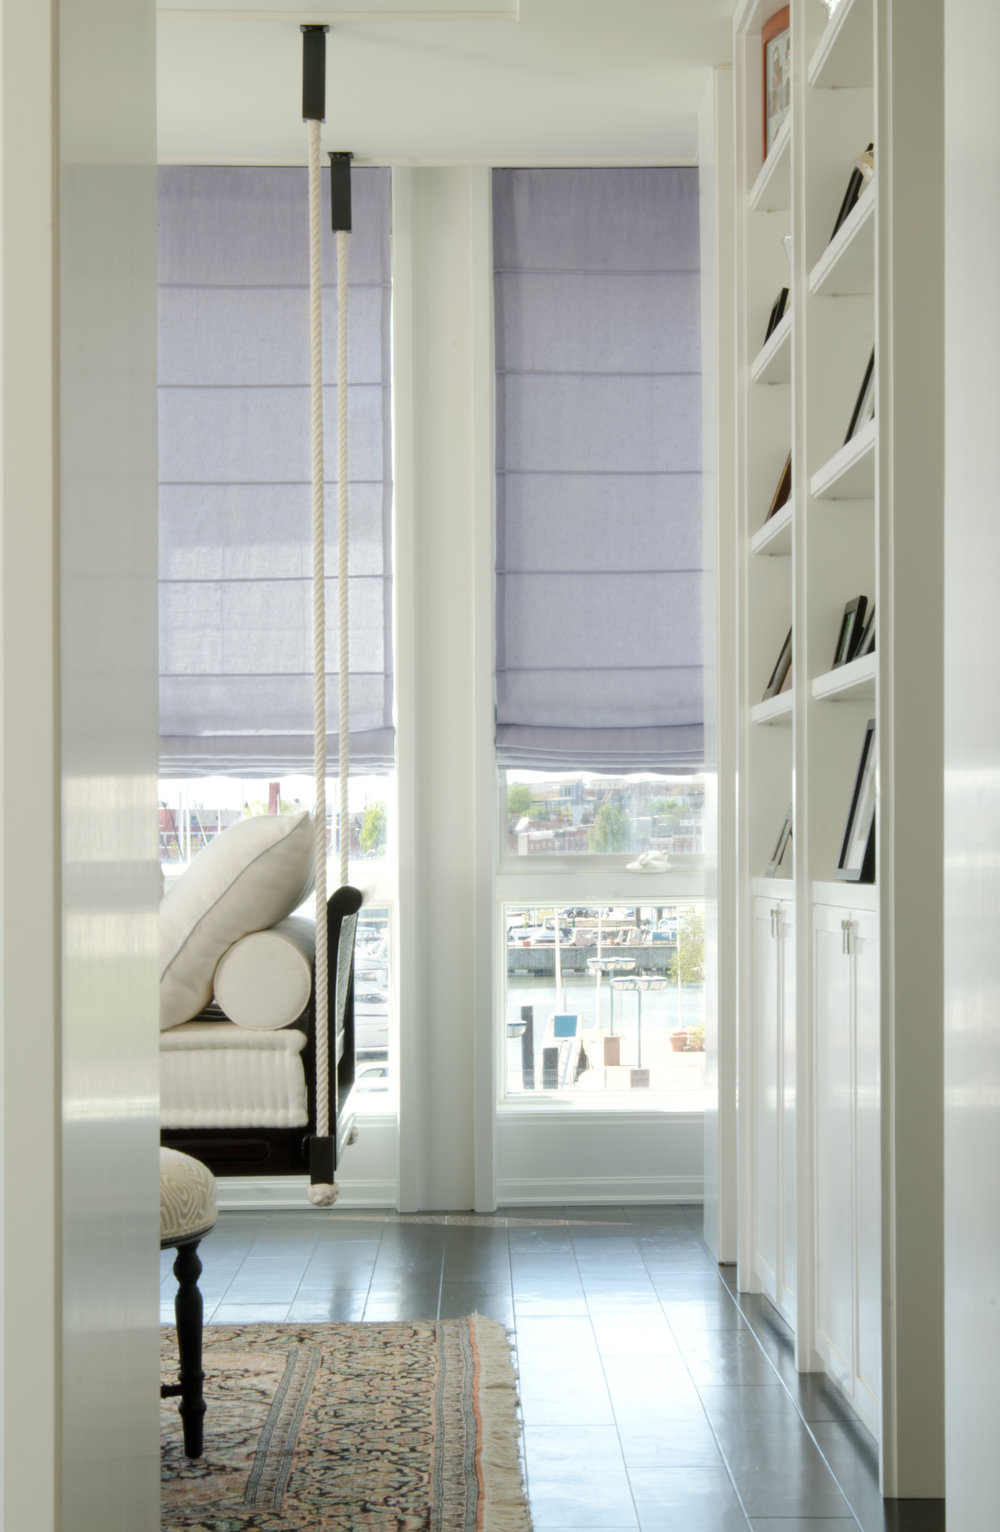 03 Bowe-Stewart-Sitting Room.jpg